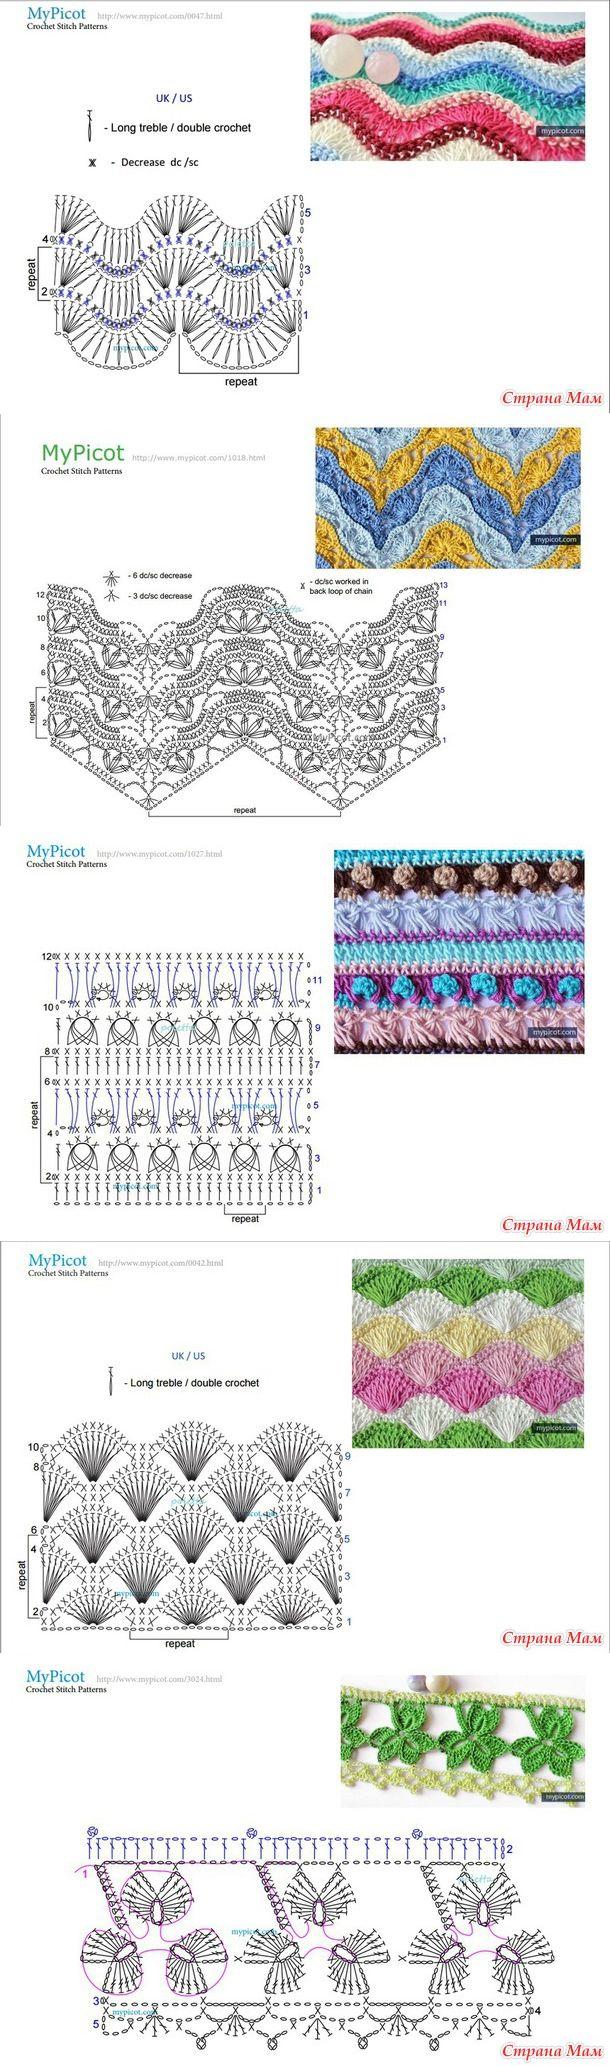 Mejores 1083 imágenes de stitch en Pinterest | Accesorios de crochet ...